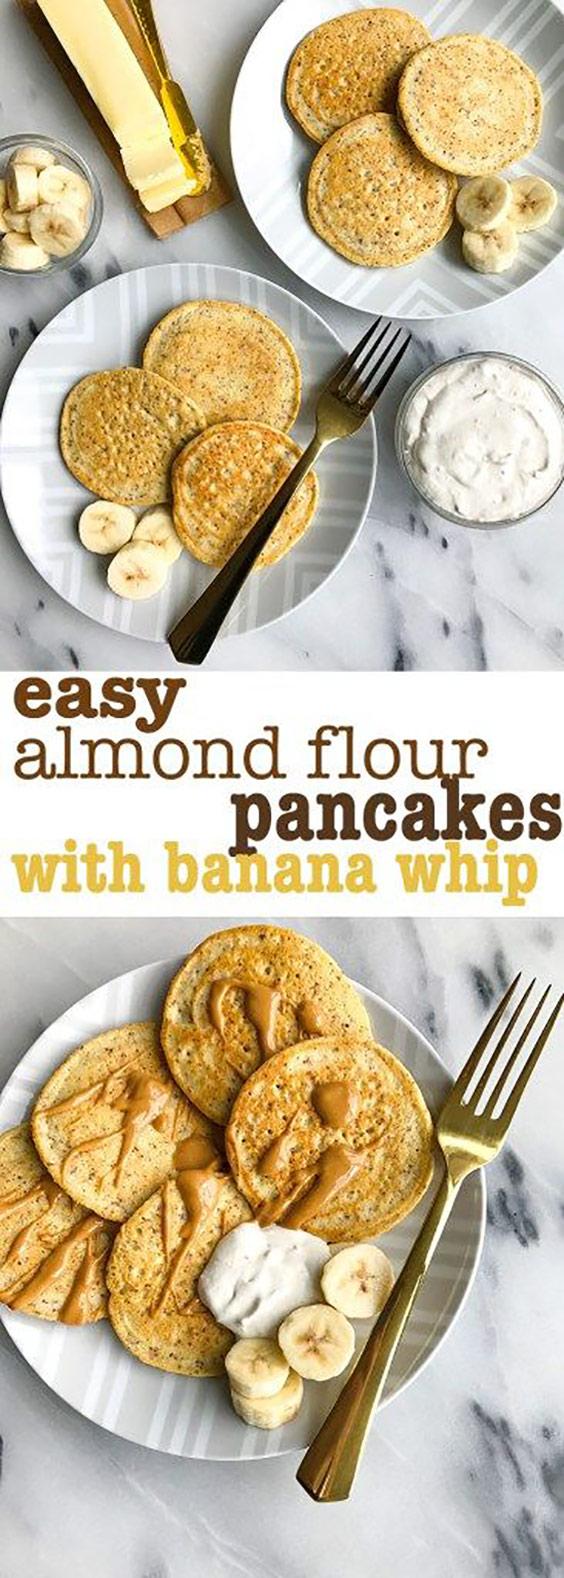 Easy Almond Flour Pancakes with Banana Whipped Cream